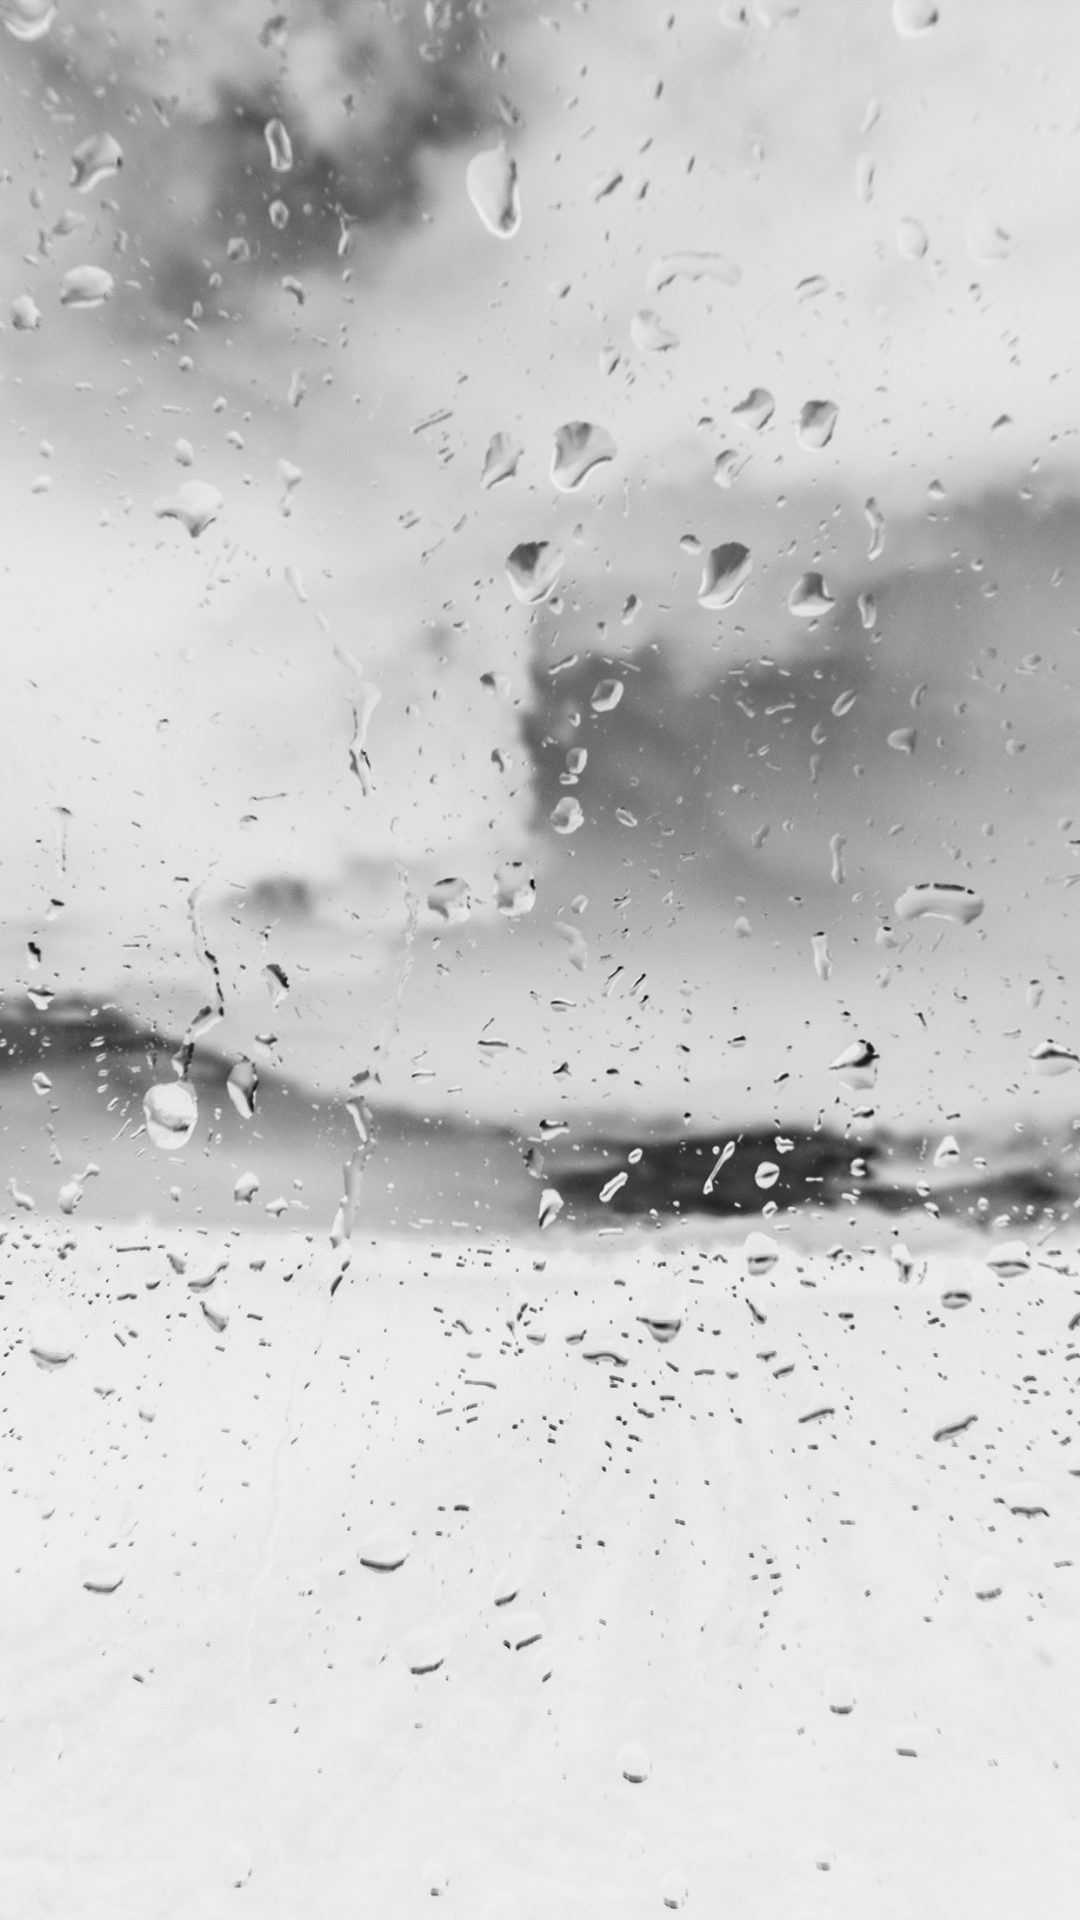 Rainy Window Nature Water Drop Road White